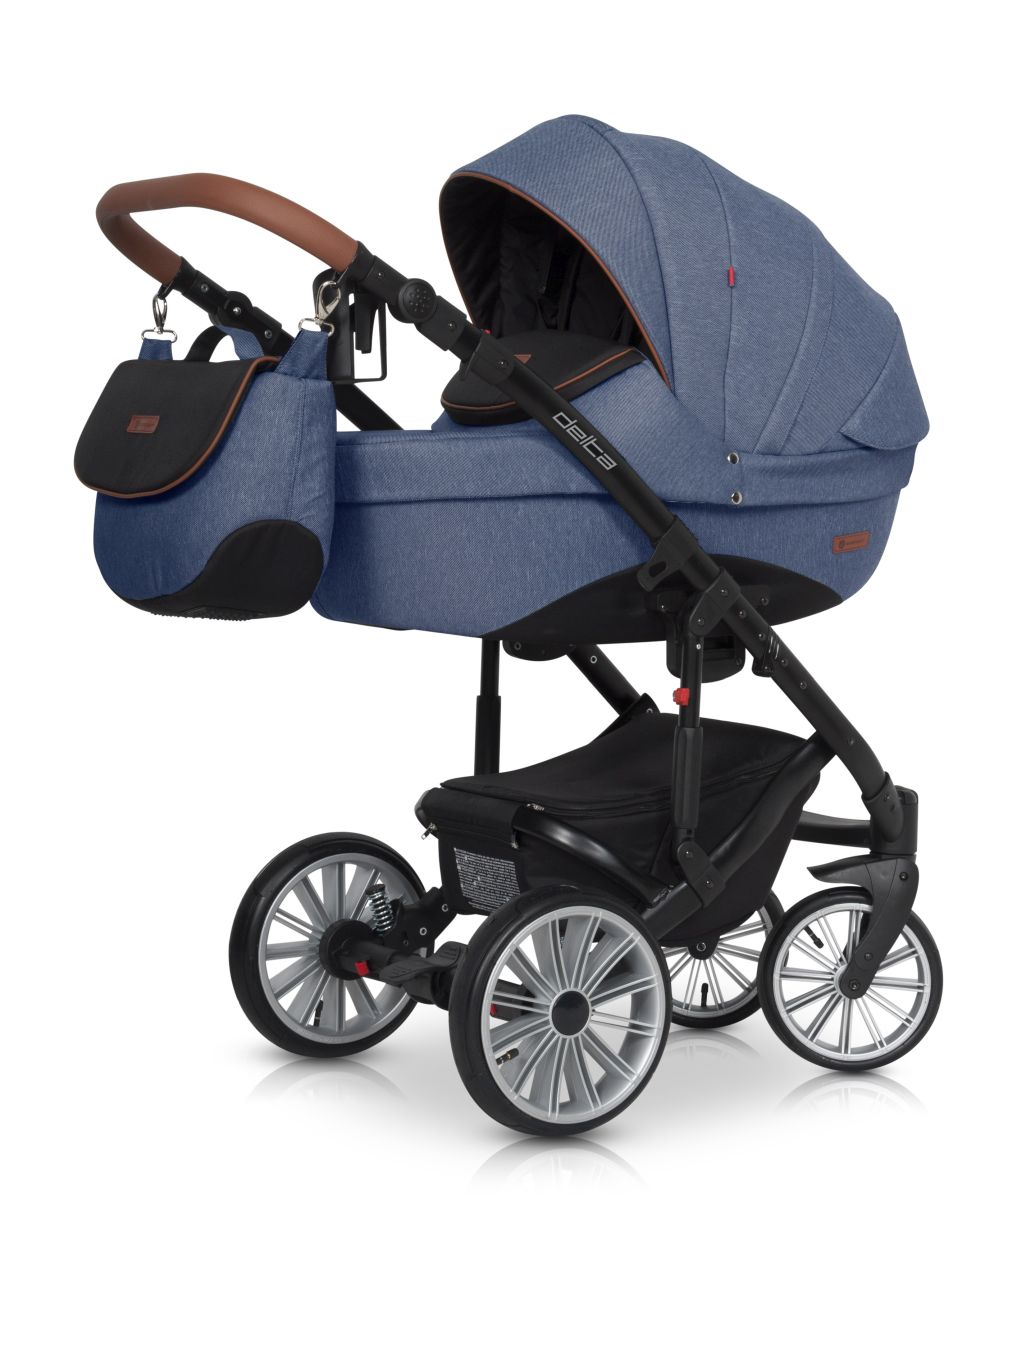 Wózek głęboko spacerowy Euro Cart Delta zestaw 2w1 kolor Denim